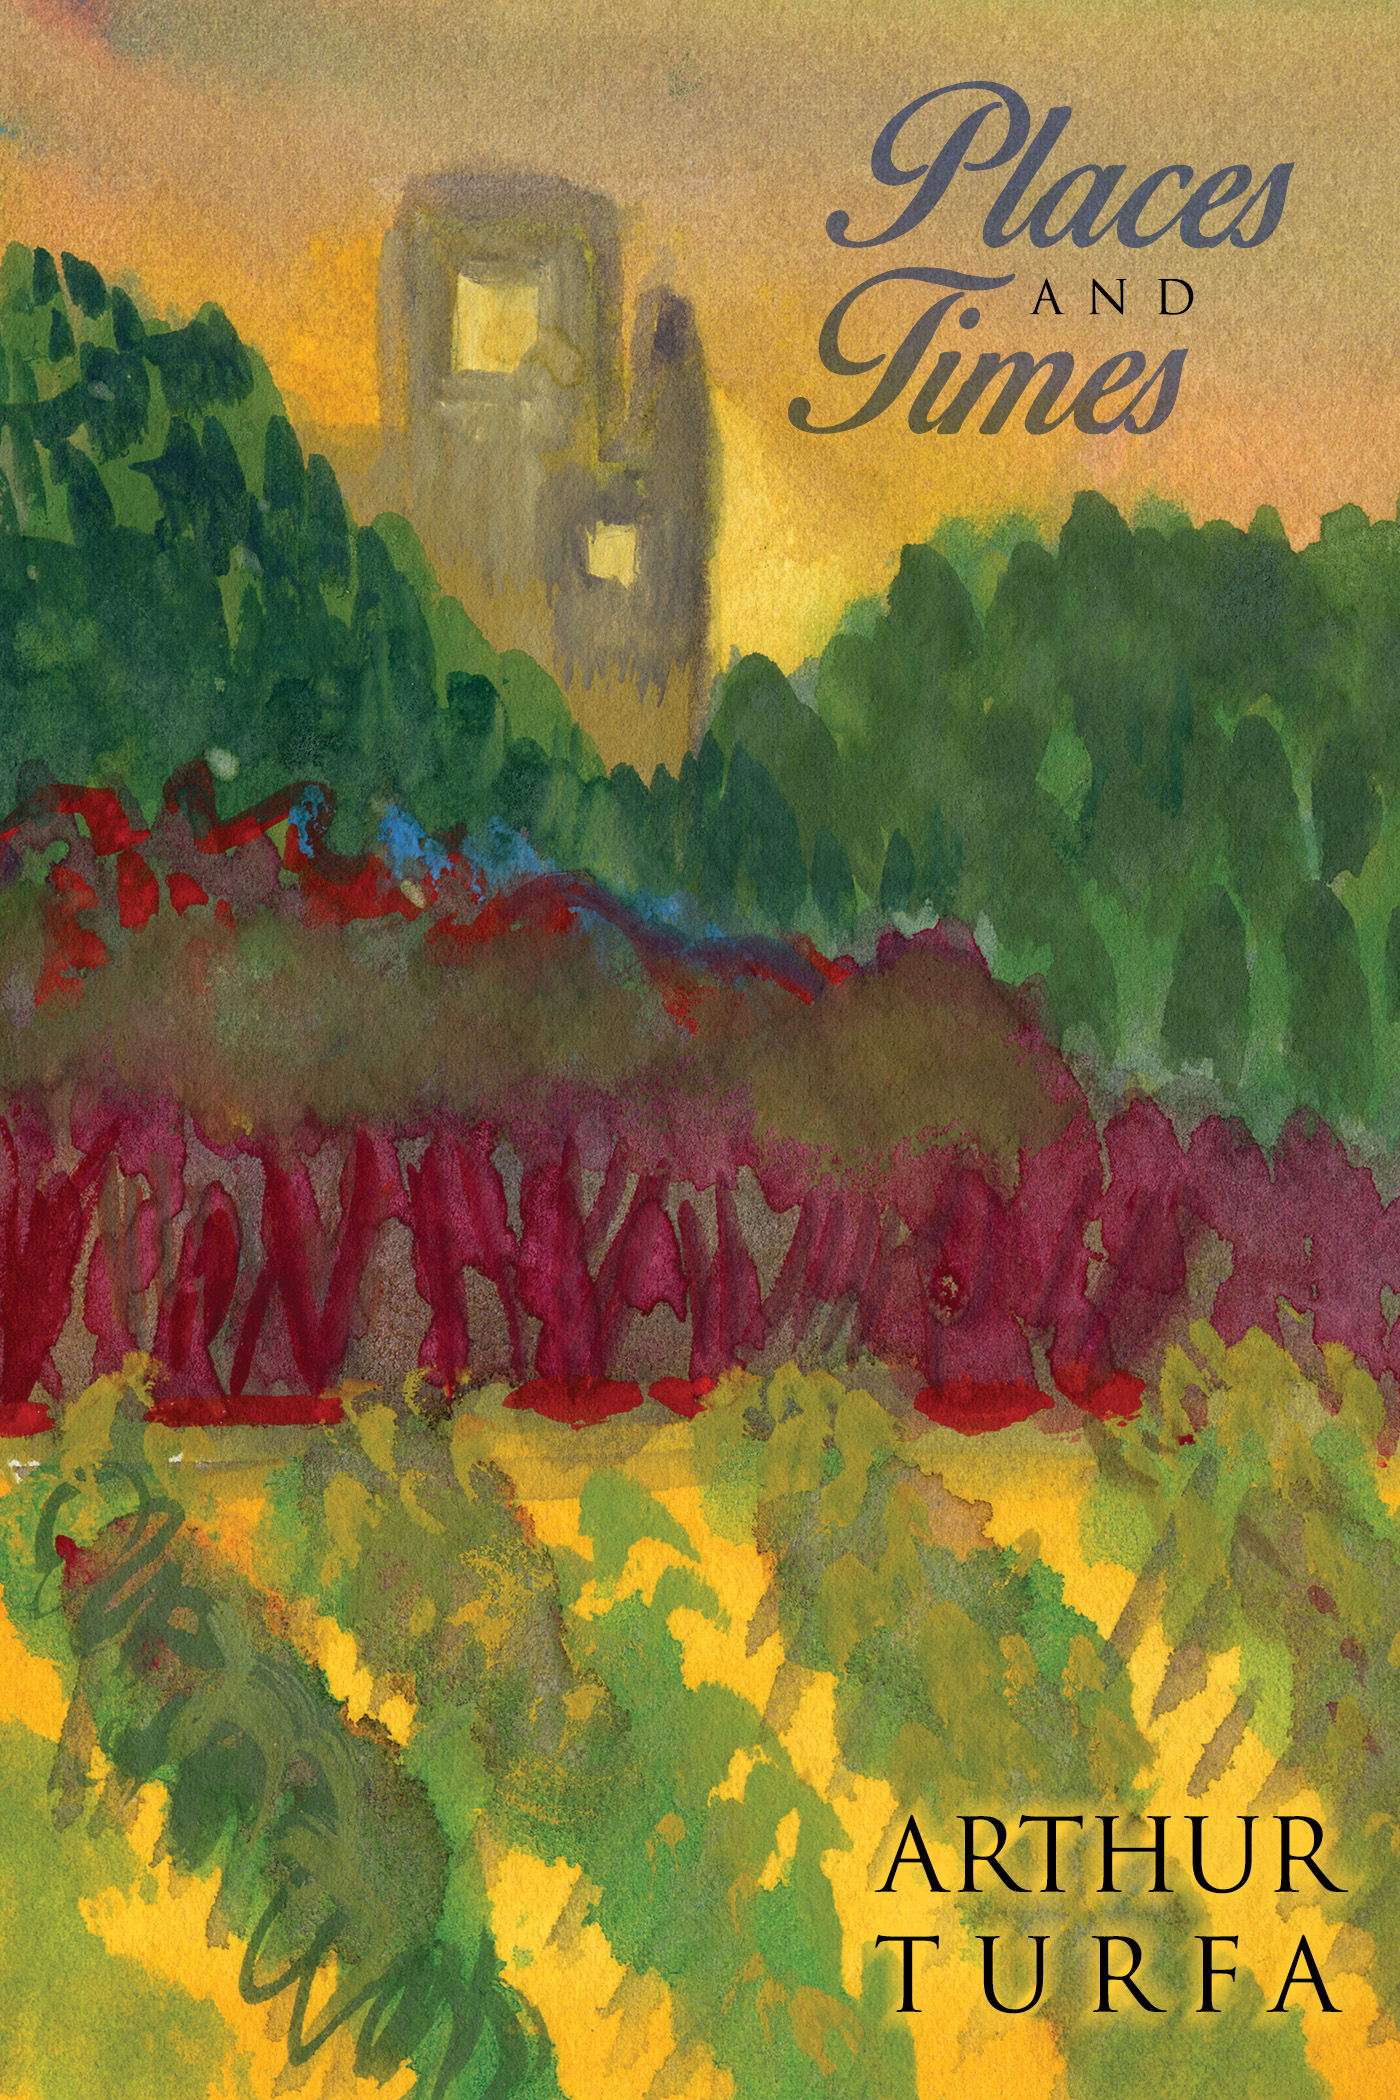 ATurfa cover art